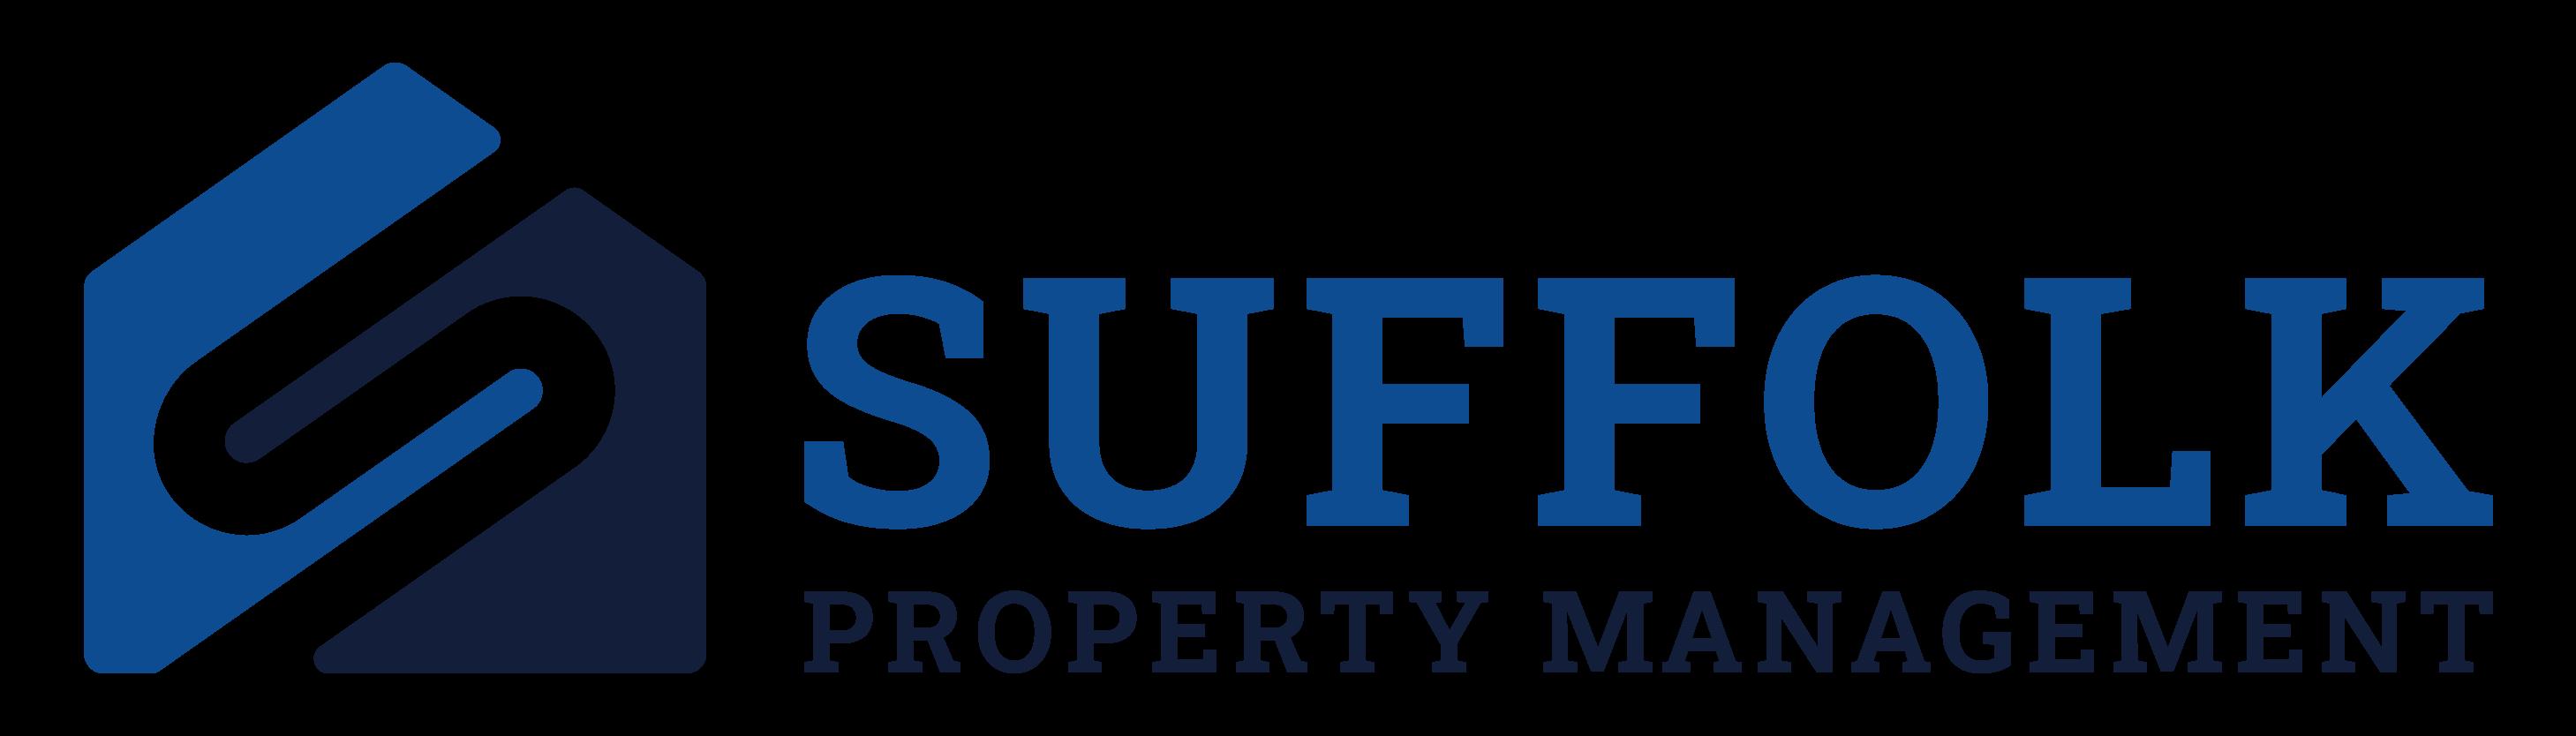 Suffolk Property Management